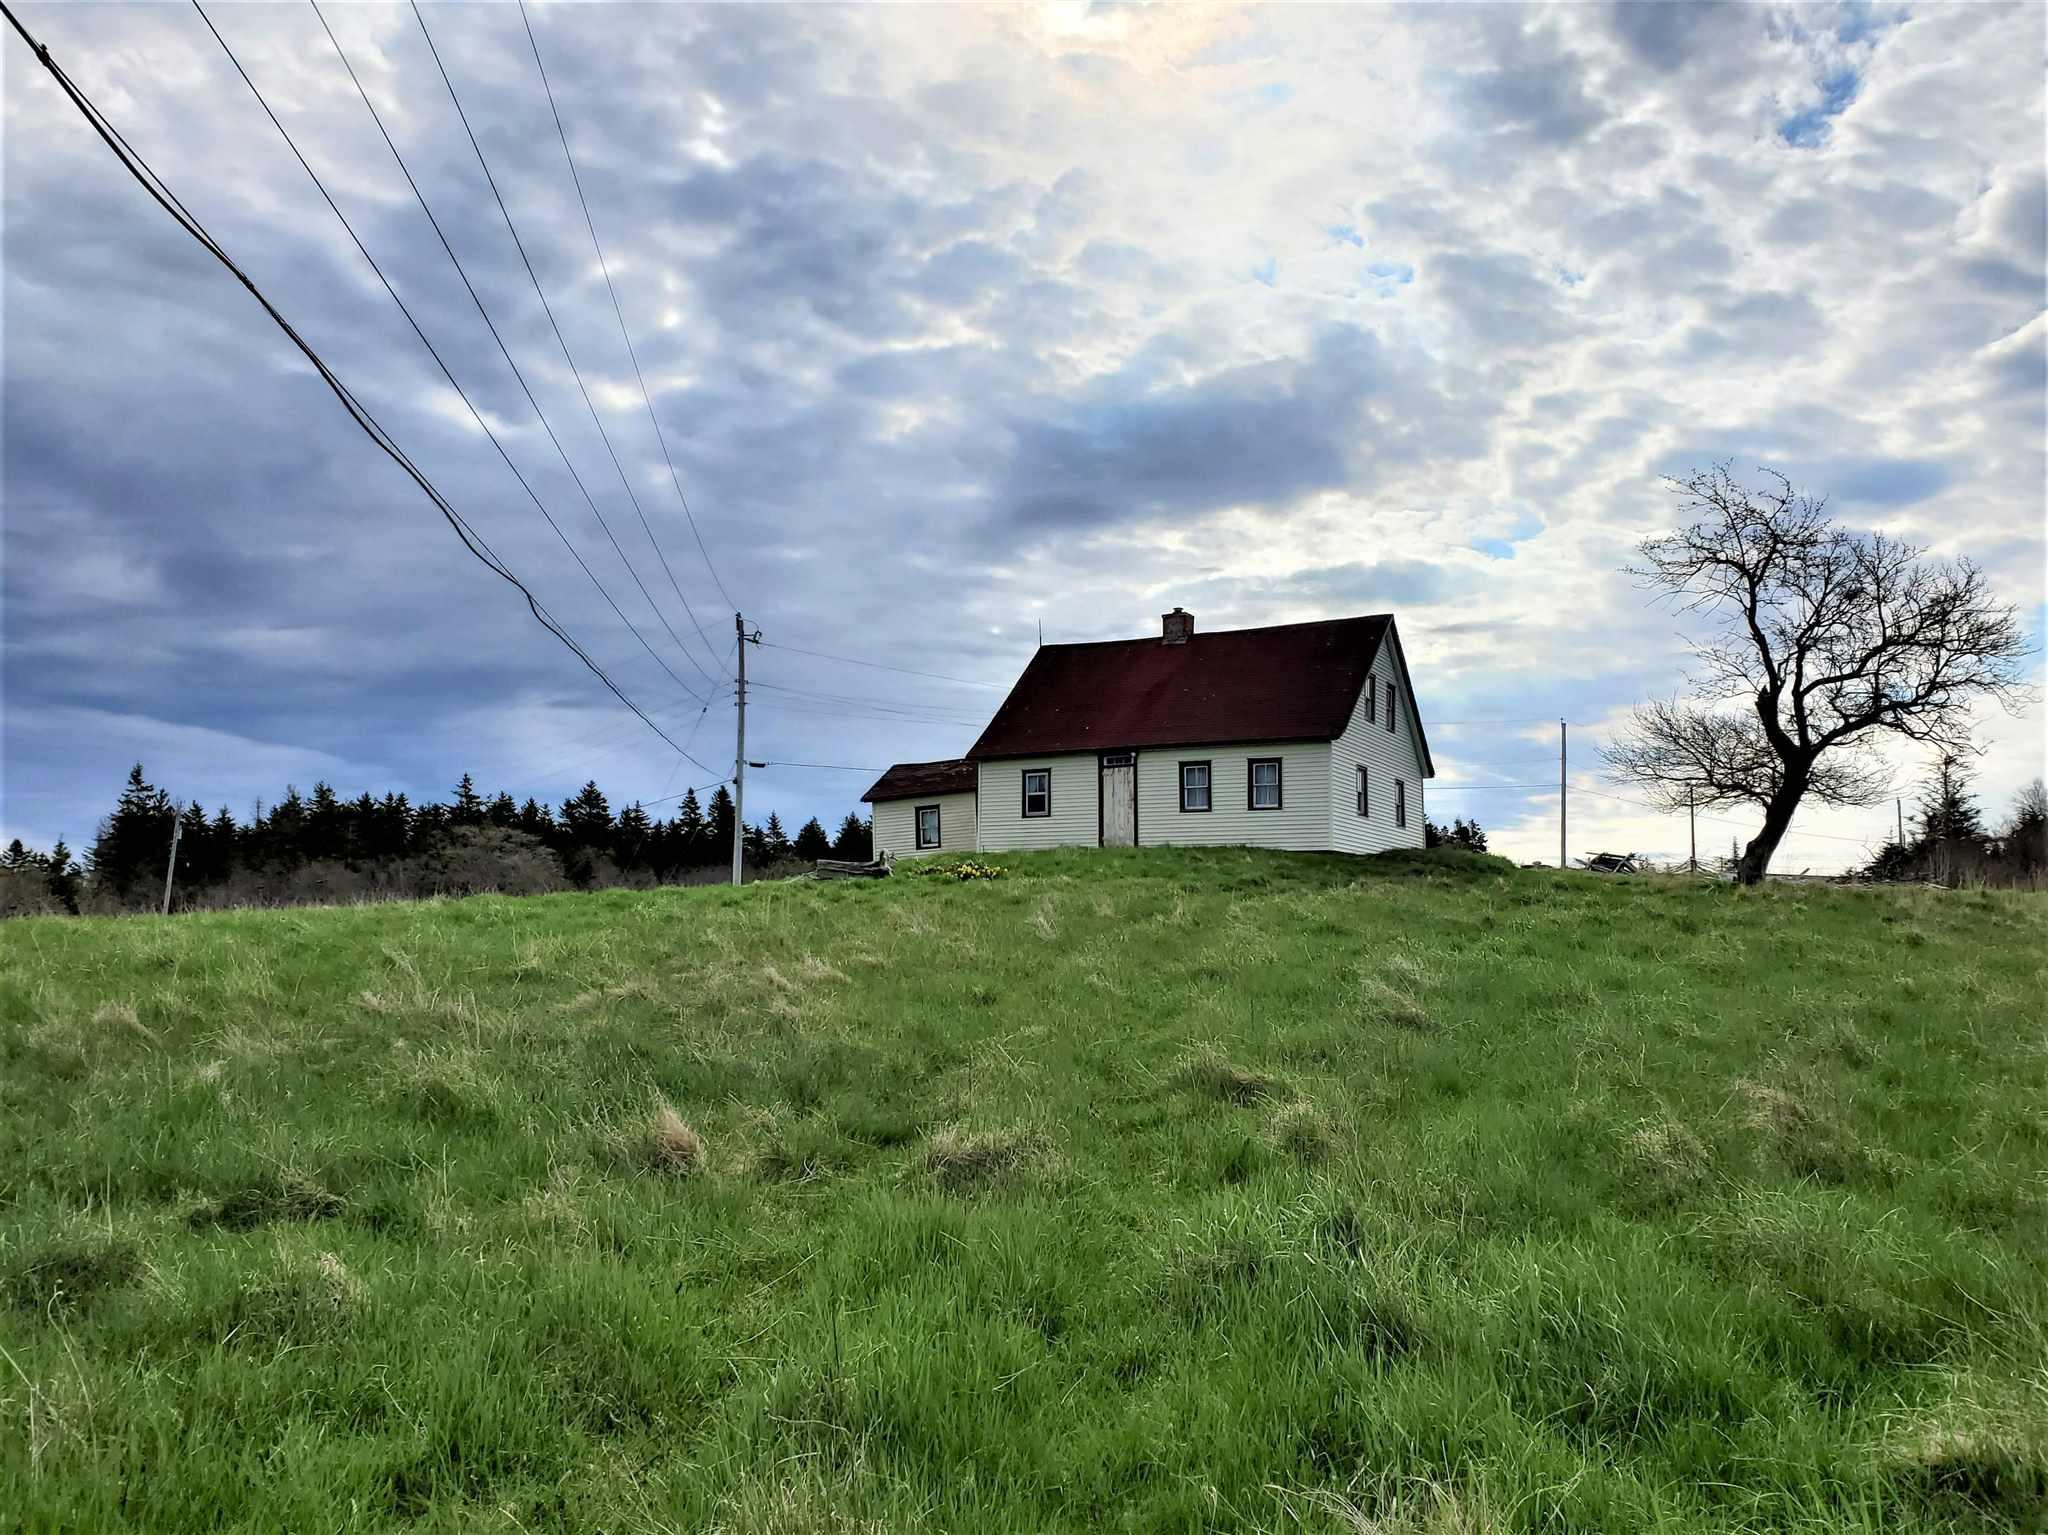 Rous Island, Indian Point Nova Scotia, Canada